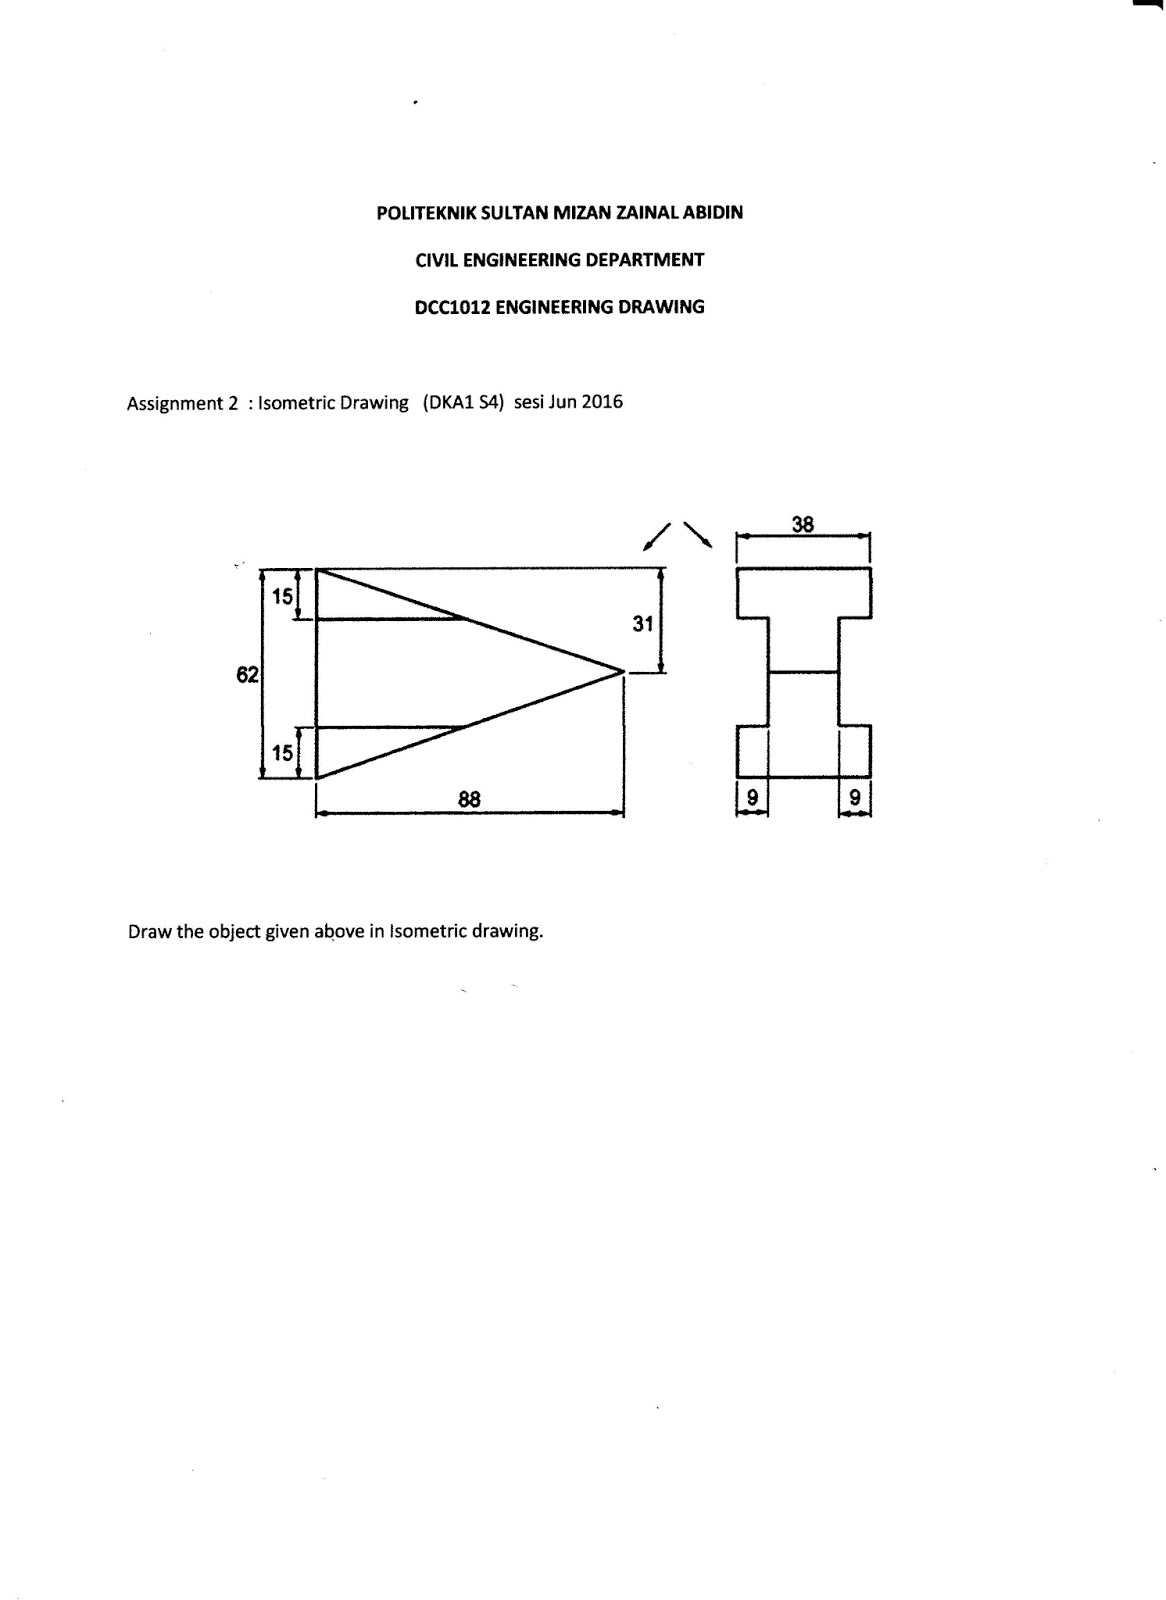 efka thesis utm my Http://wwwefkautmmy/thesis/images/4master/2005/2jsb-p/part1/humamnukmansungkarma031218d03tt1doc.